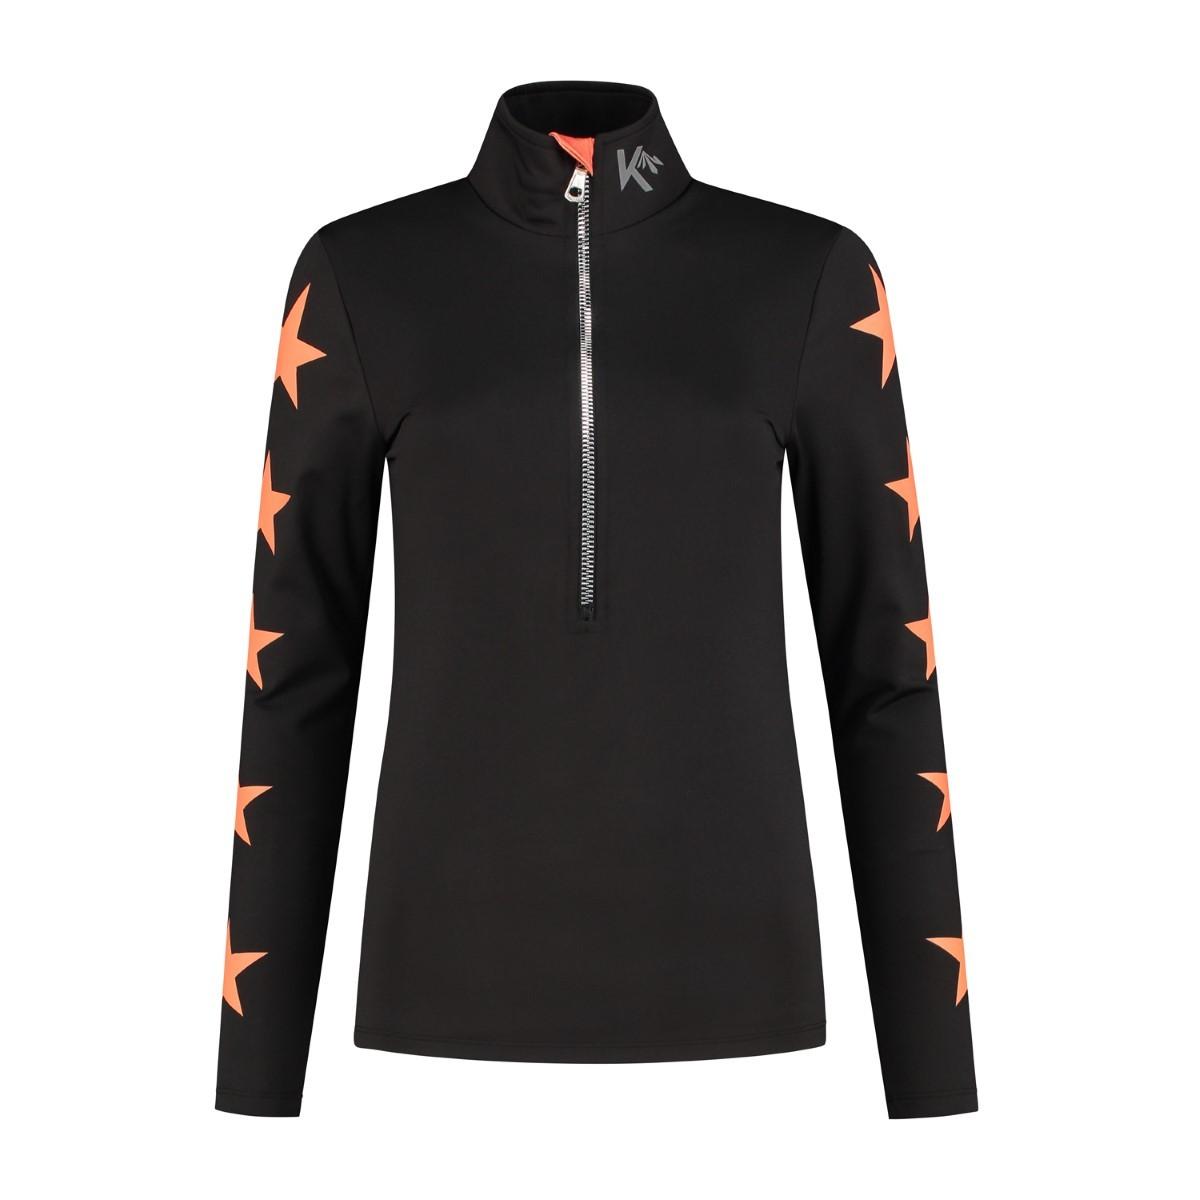 Kou Sportswear 2nd layer pully Orange.com Stars